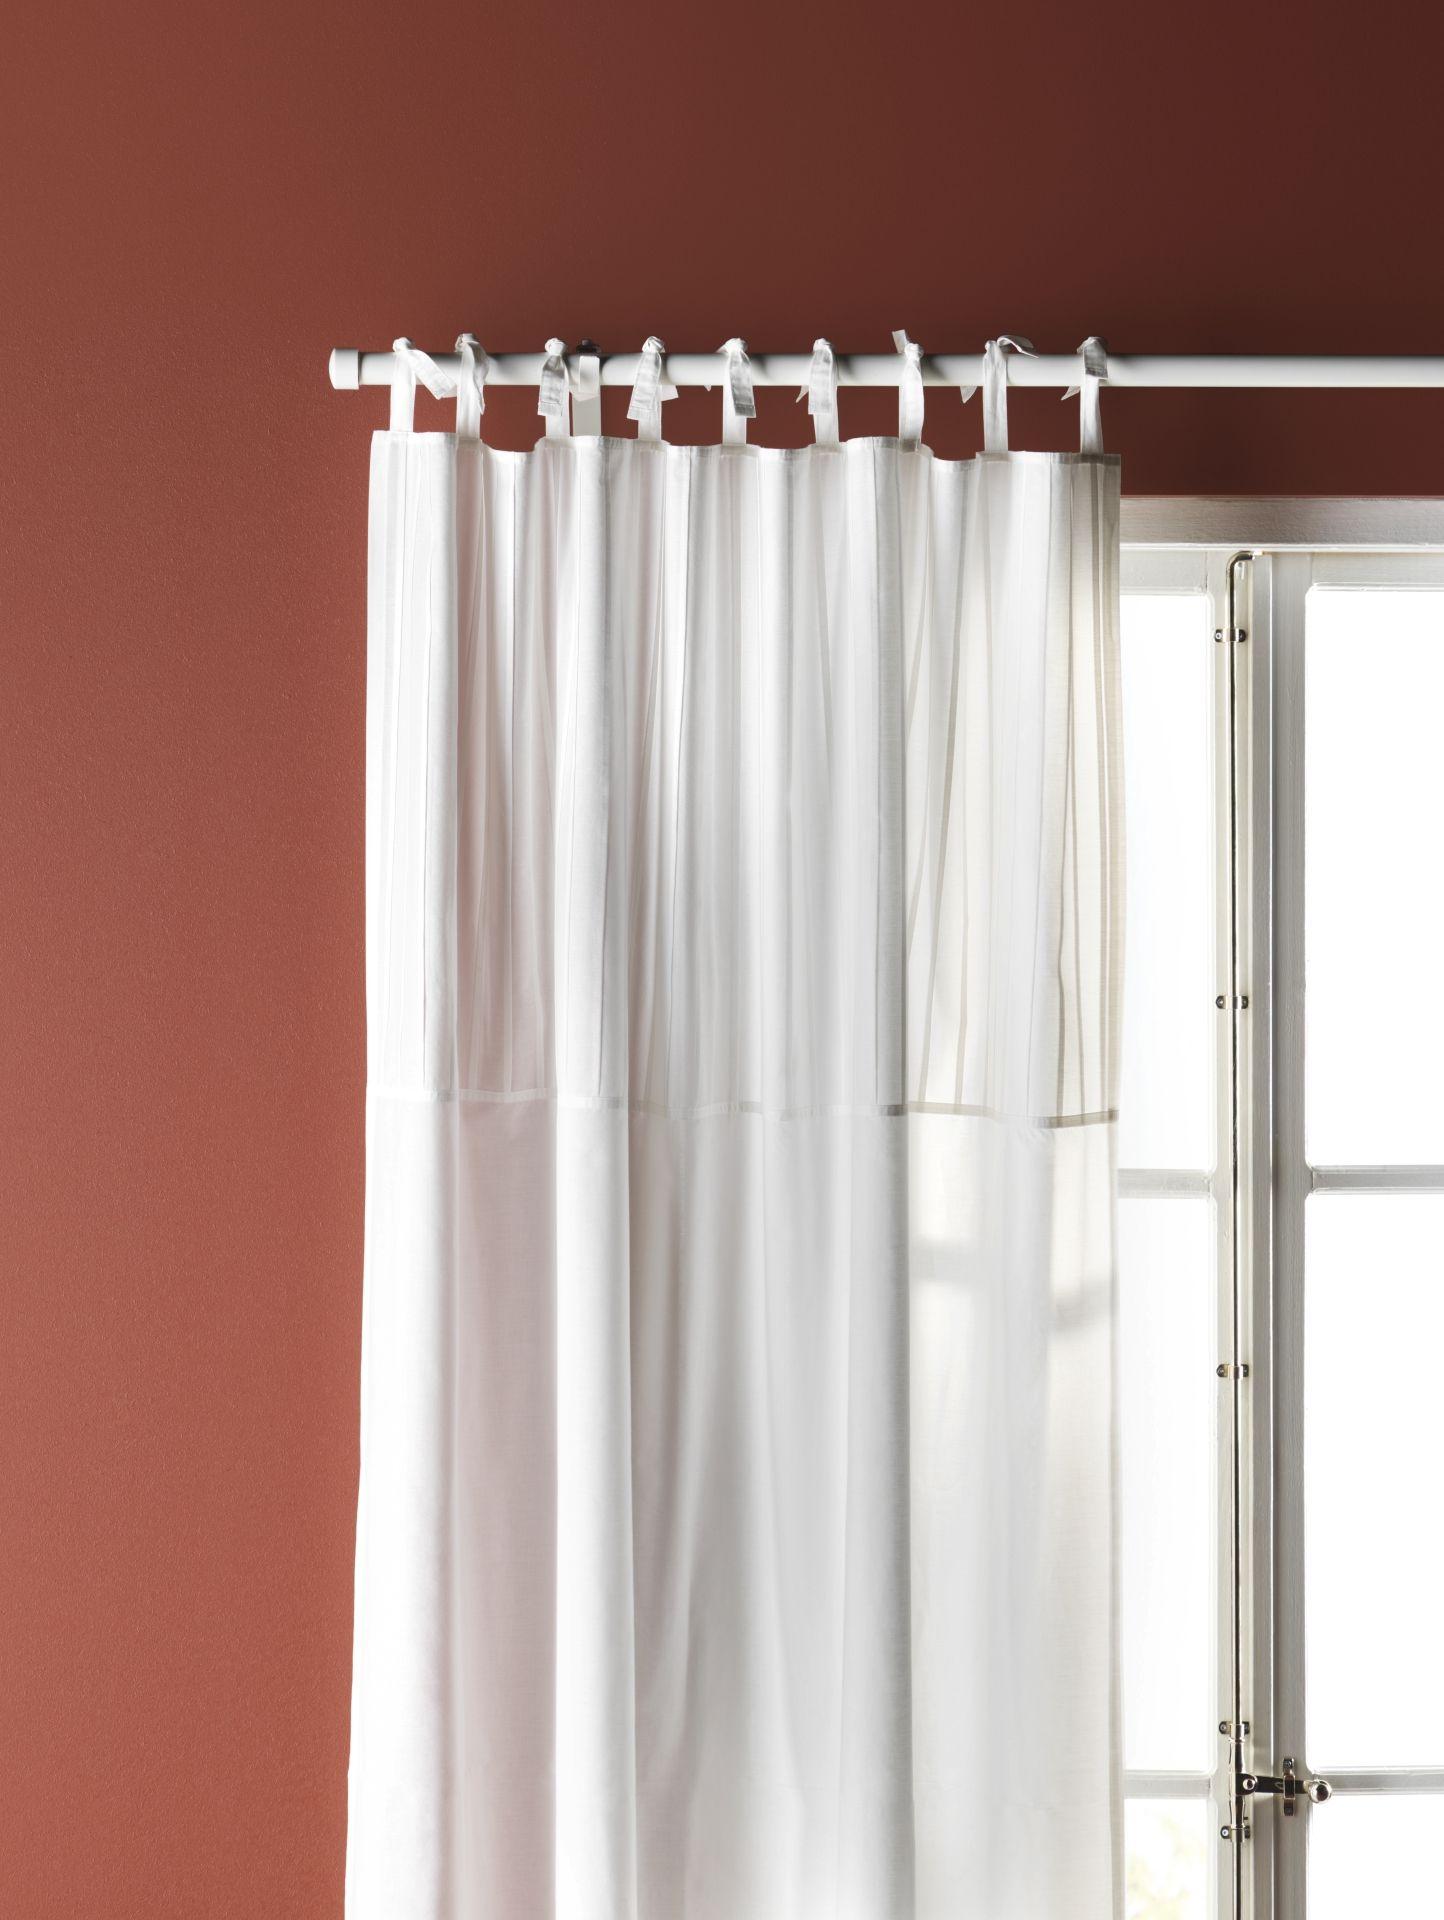 PÄRLBLAD Gordijnen, 1 paar, wit | Pinterest - Catalogus en Ikea